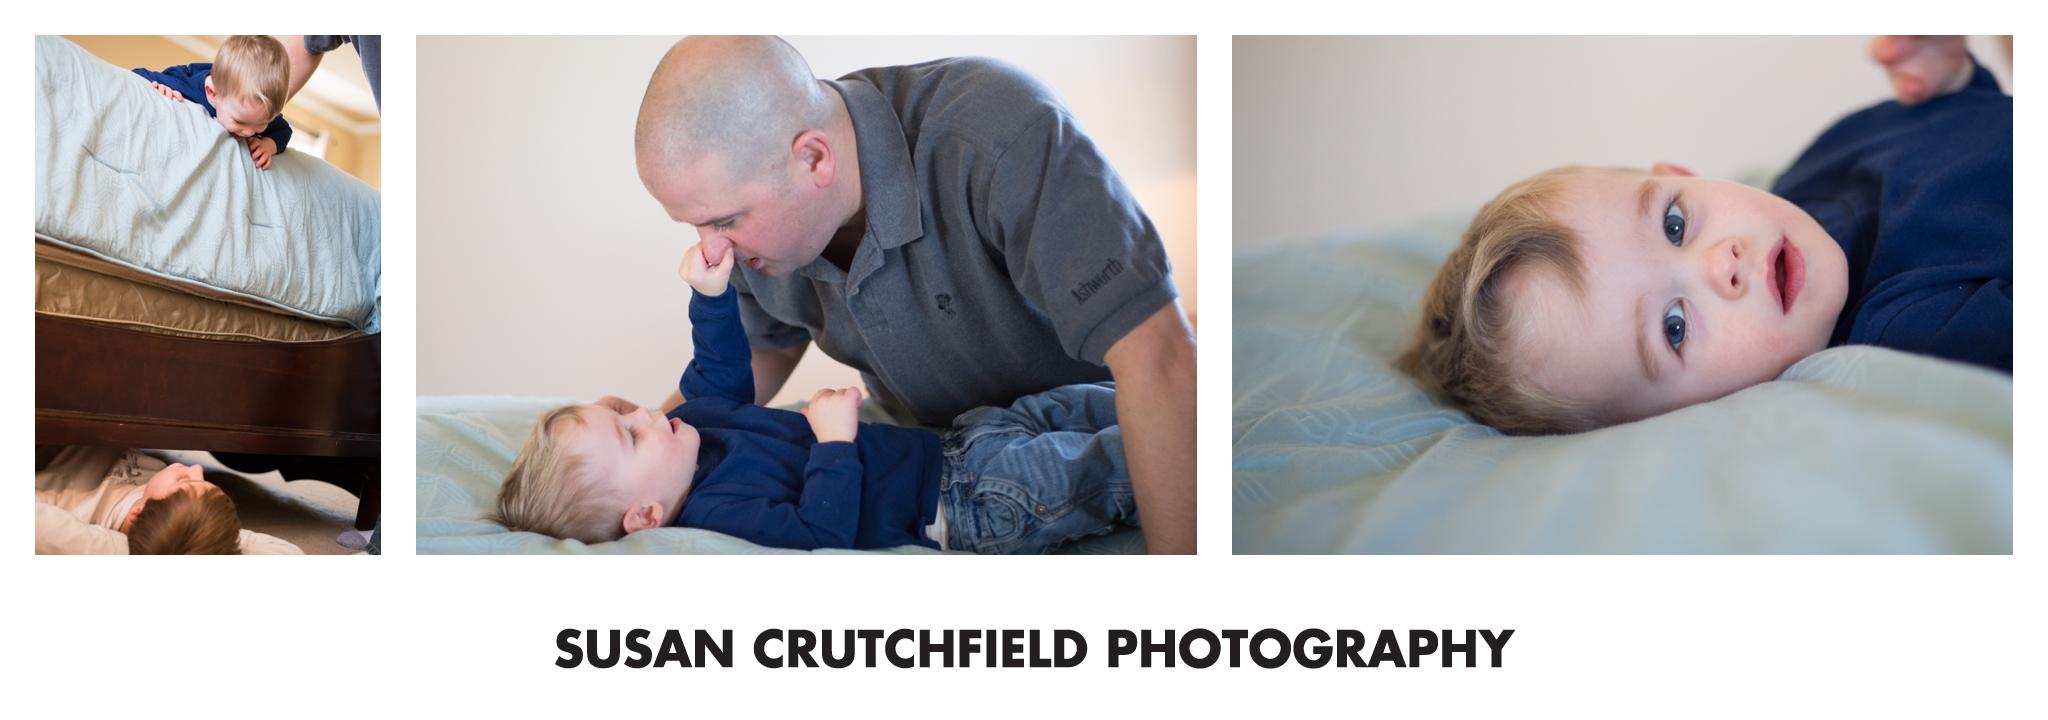 Buford Children's Photographer